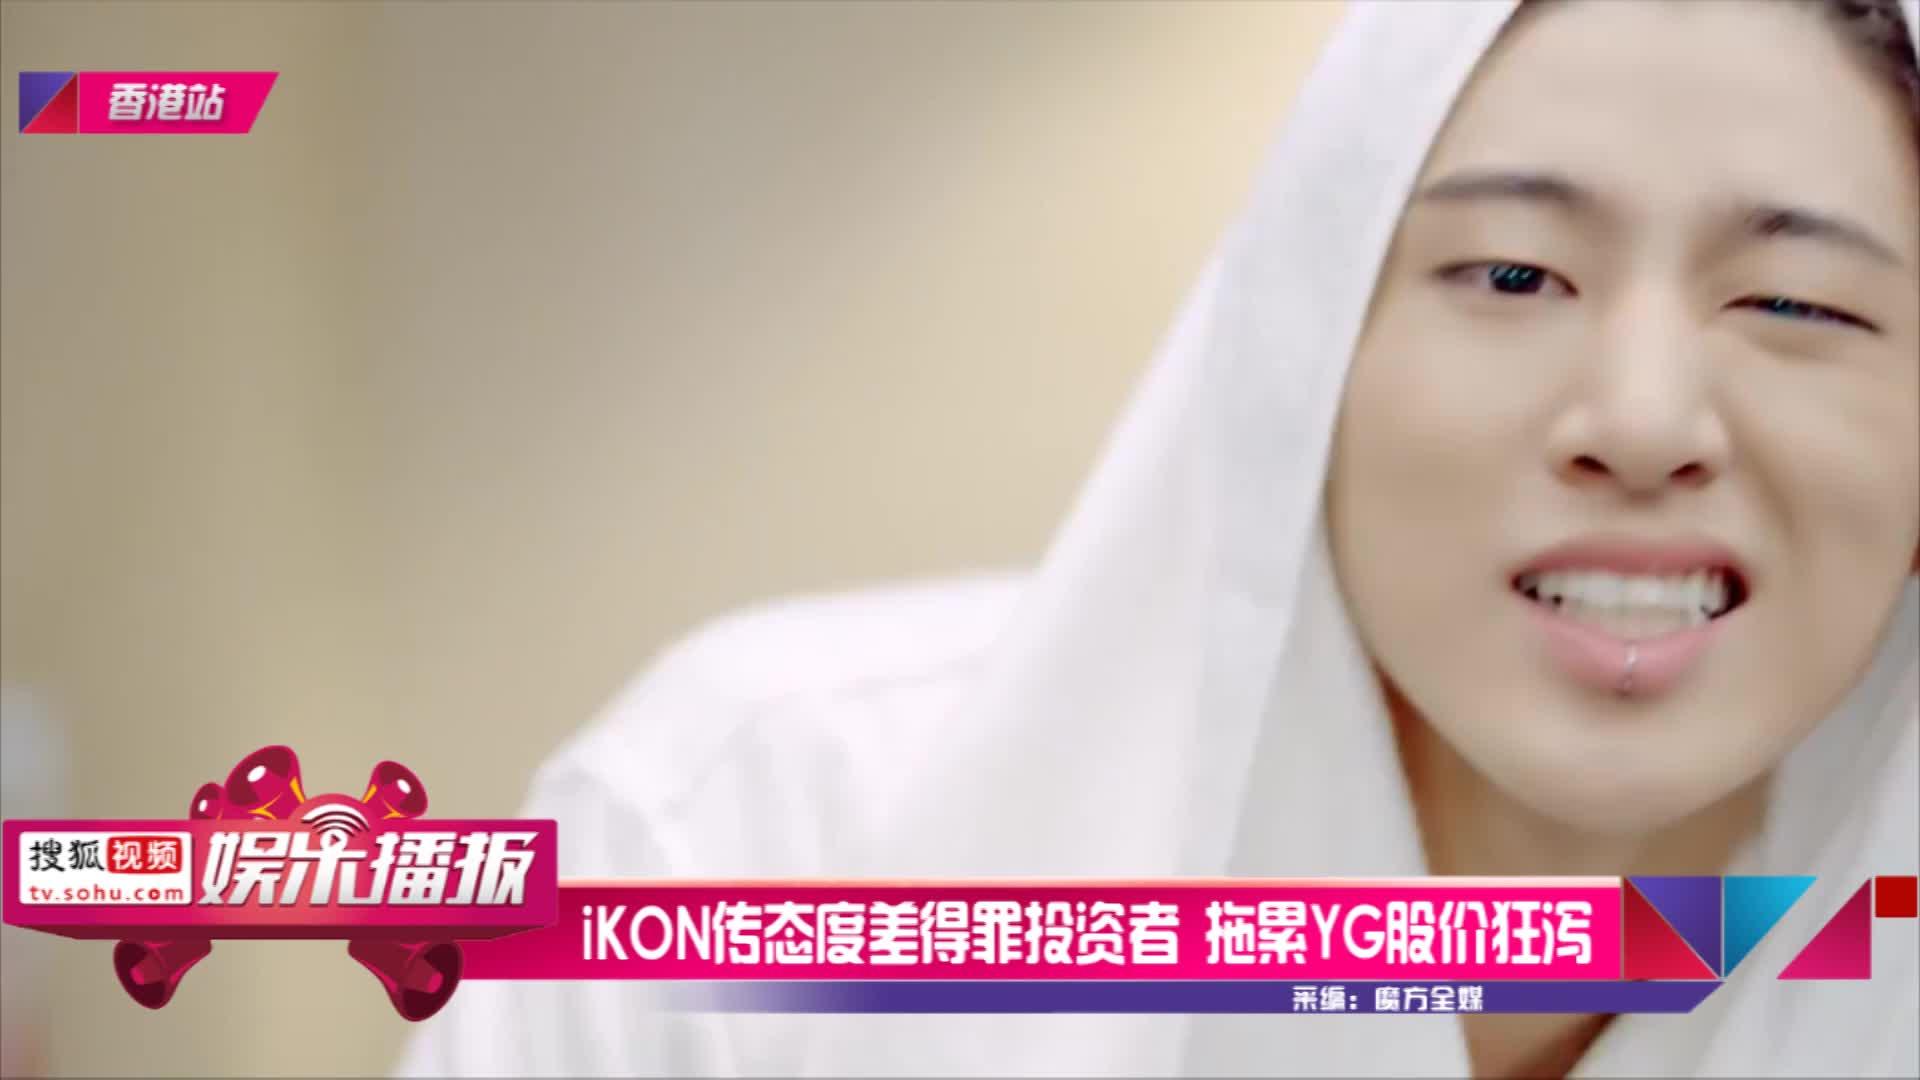 iKON传态度差得罪投资者 拖累YG股价狂泻